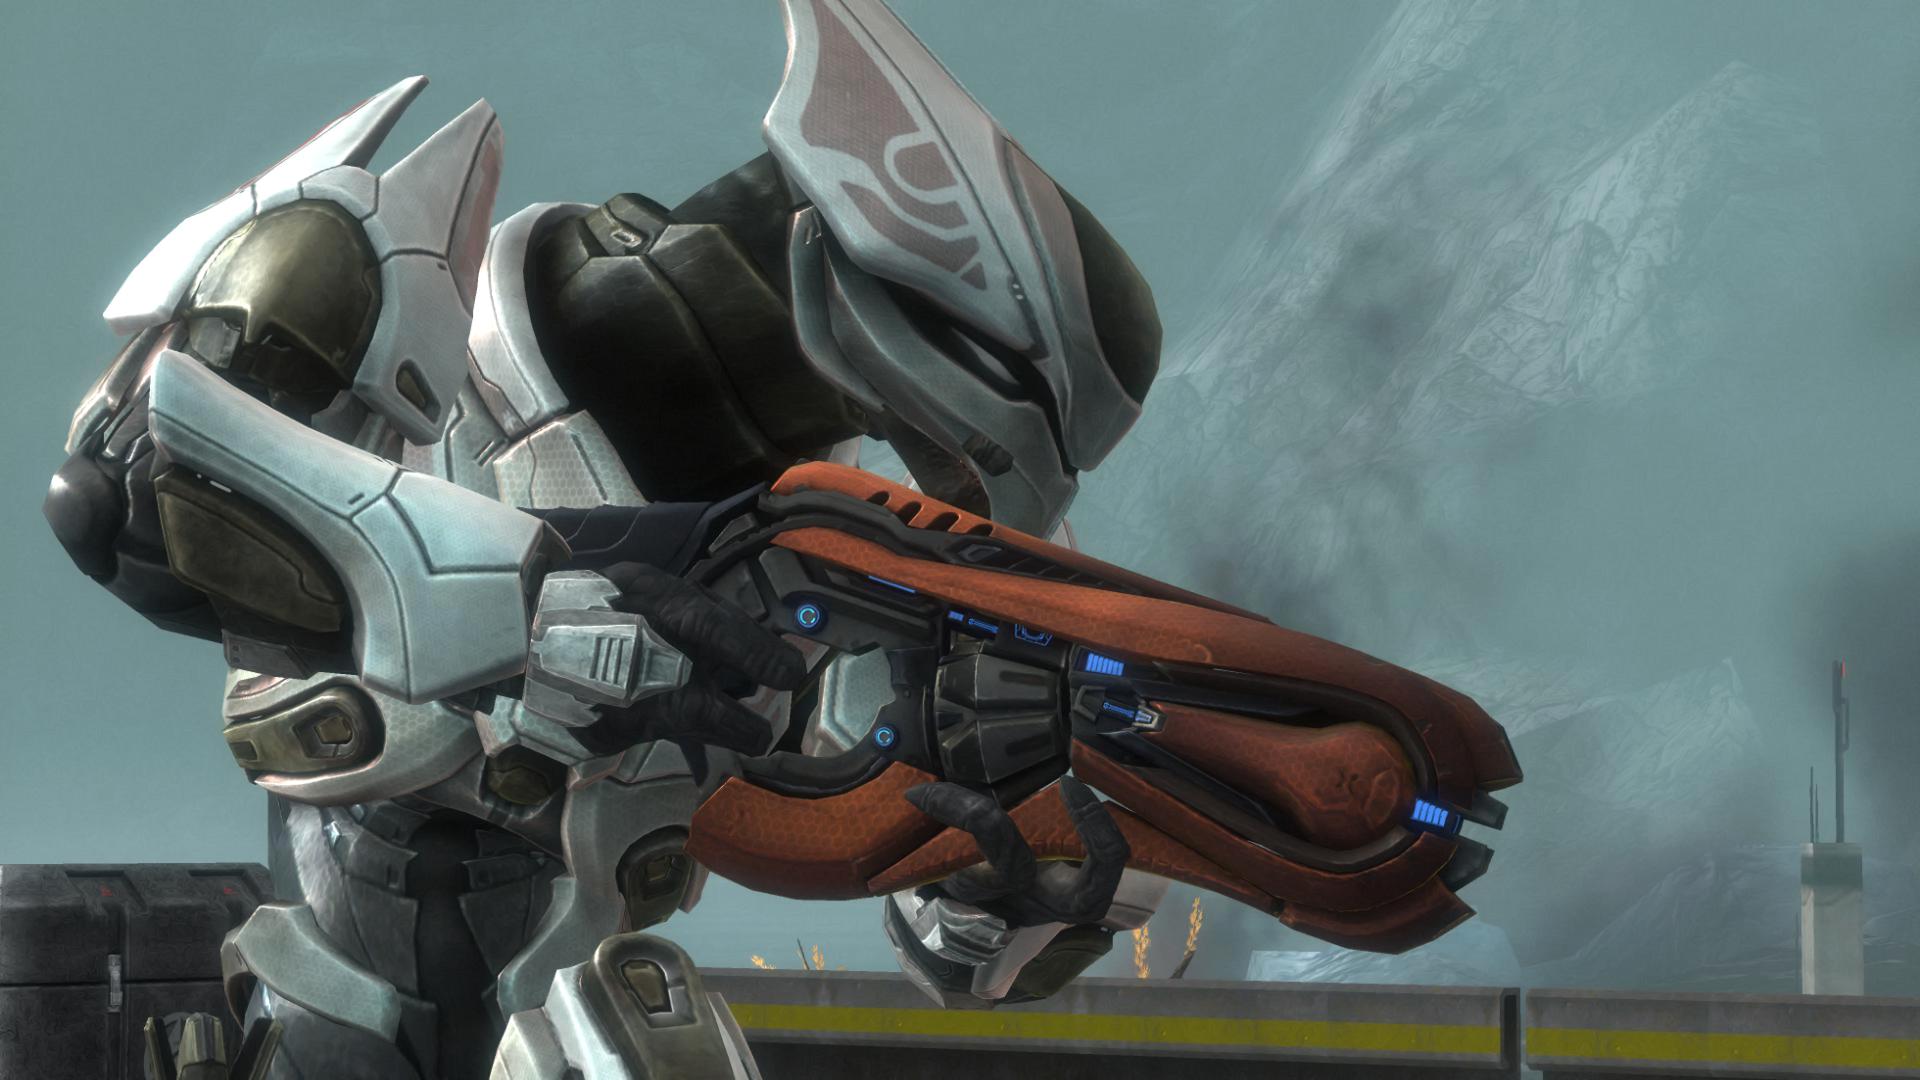 Image - Halo-Reach-Covenant-Files-06-2-Sangheili-Elite ...